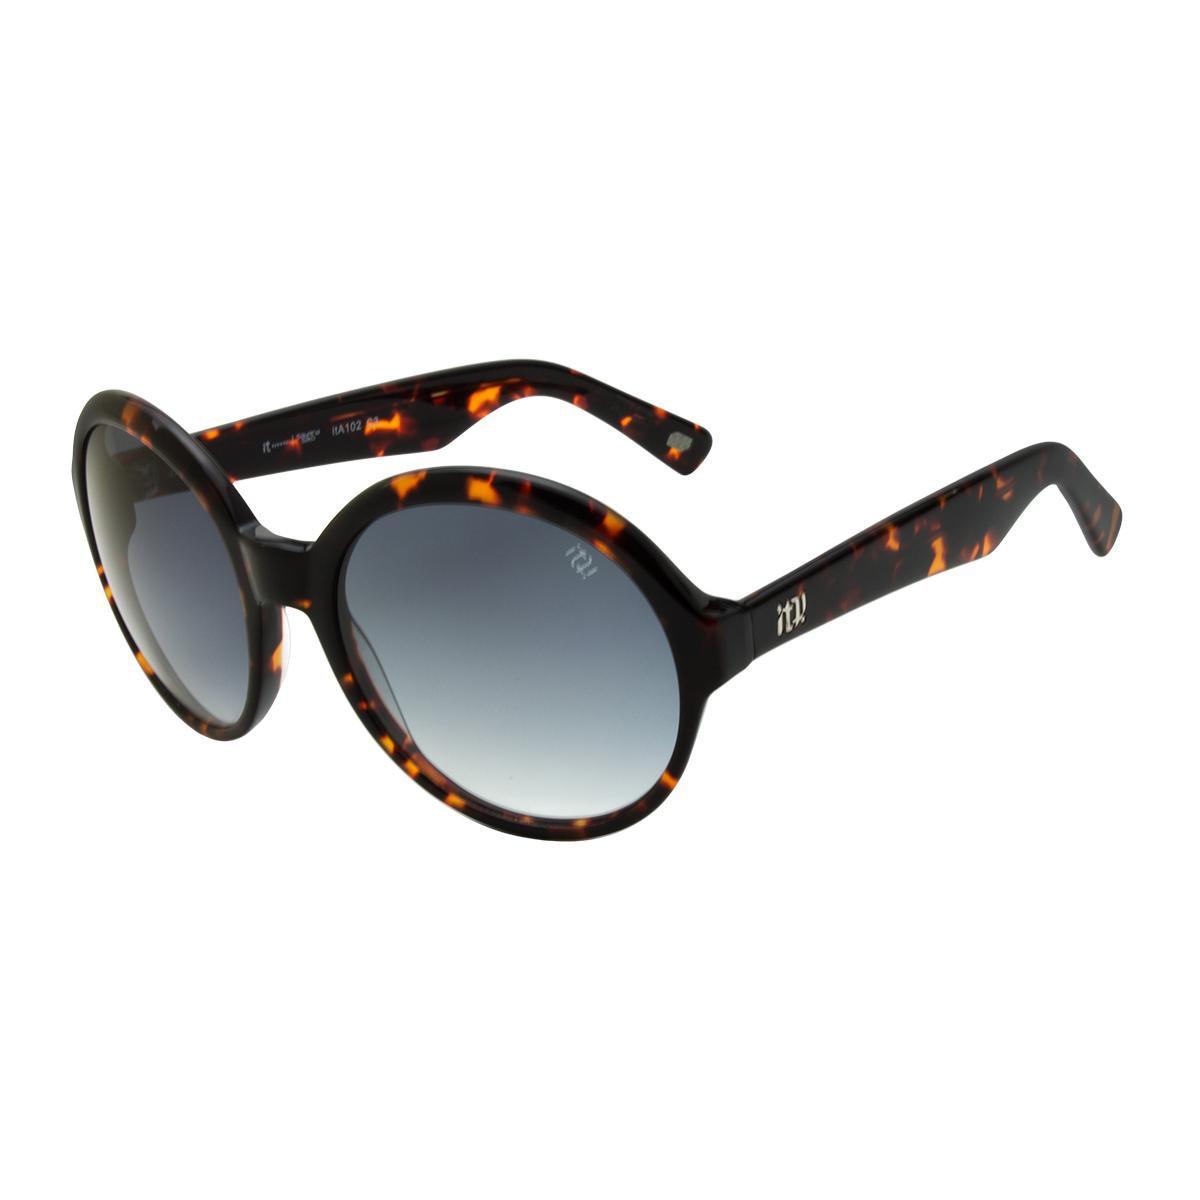 Óculos De Sol It Eyewear Luxe A102 - C3 - Feminino - Compre Agora ... 958bcac397